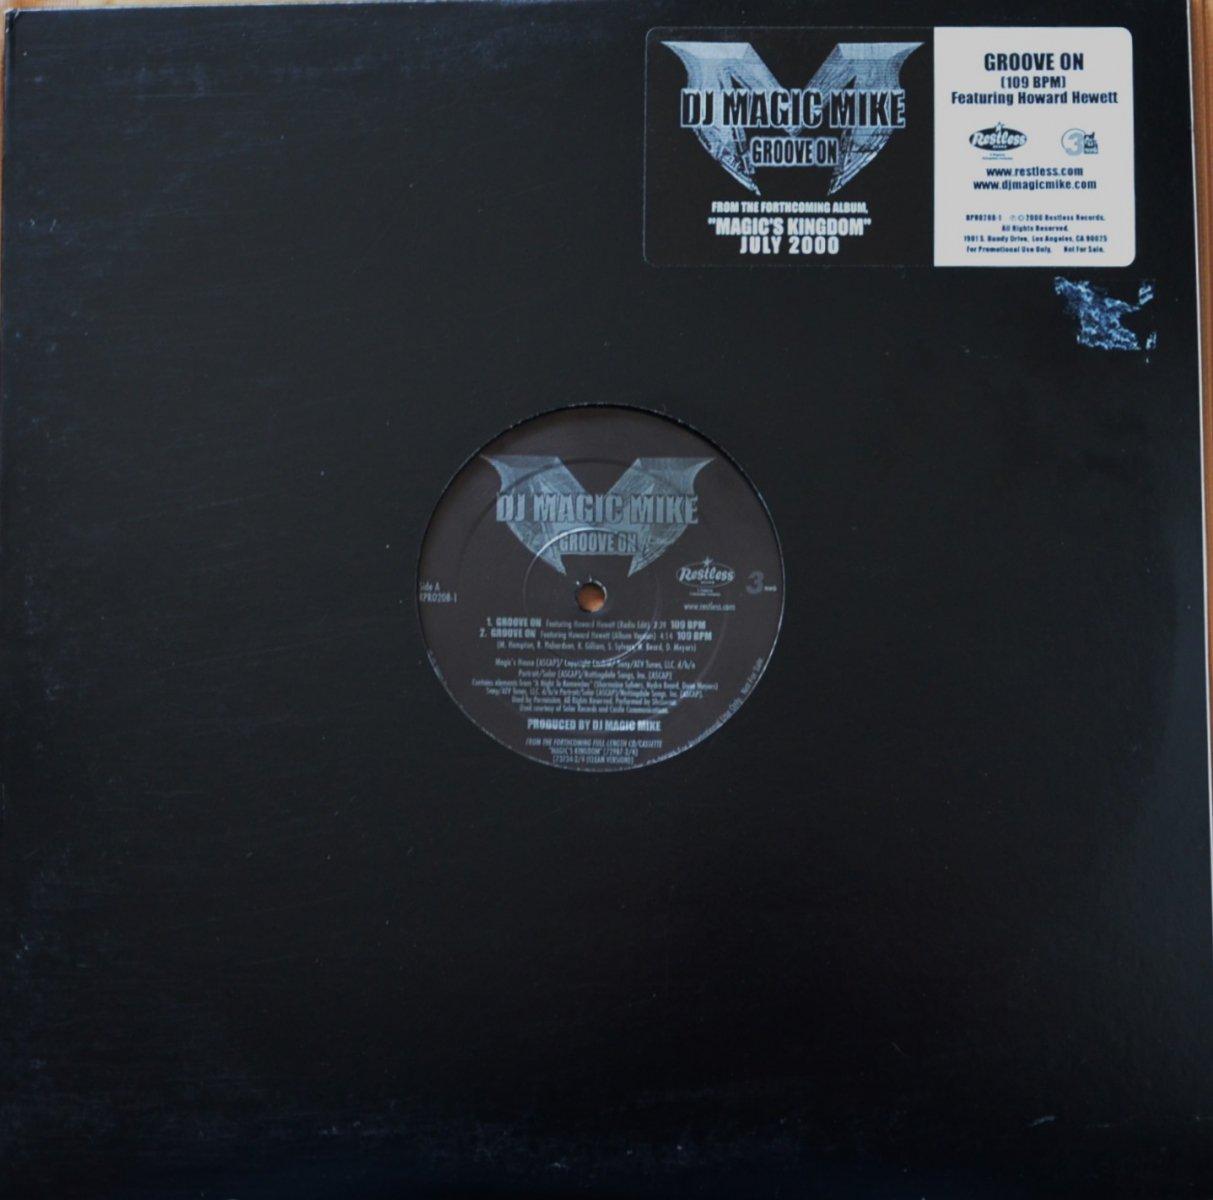 DJ MAGIC MIKE / GROOVE ON (FEAT.HOWARD HEWETT) (12